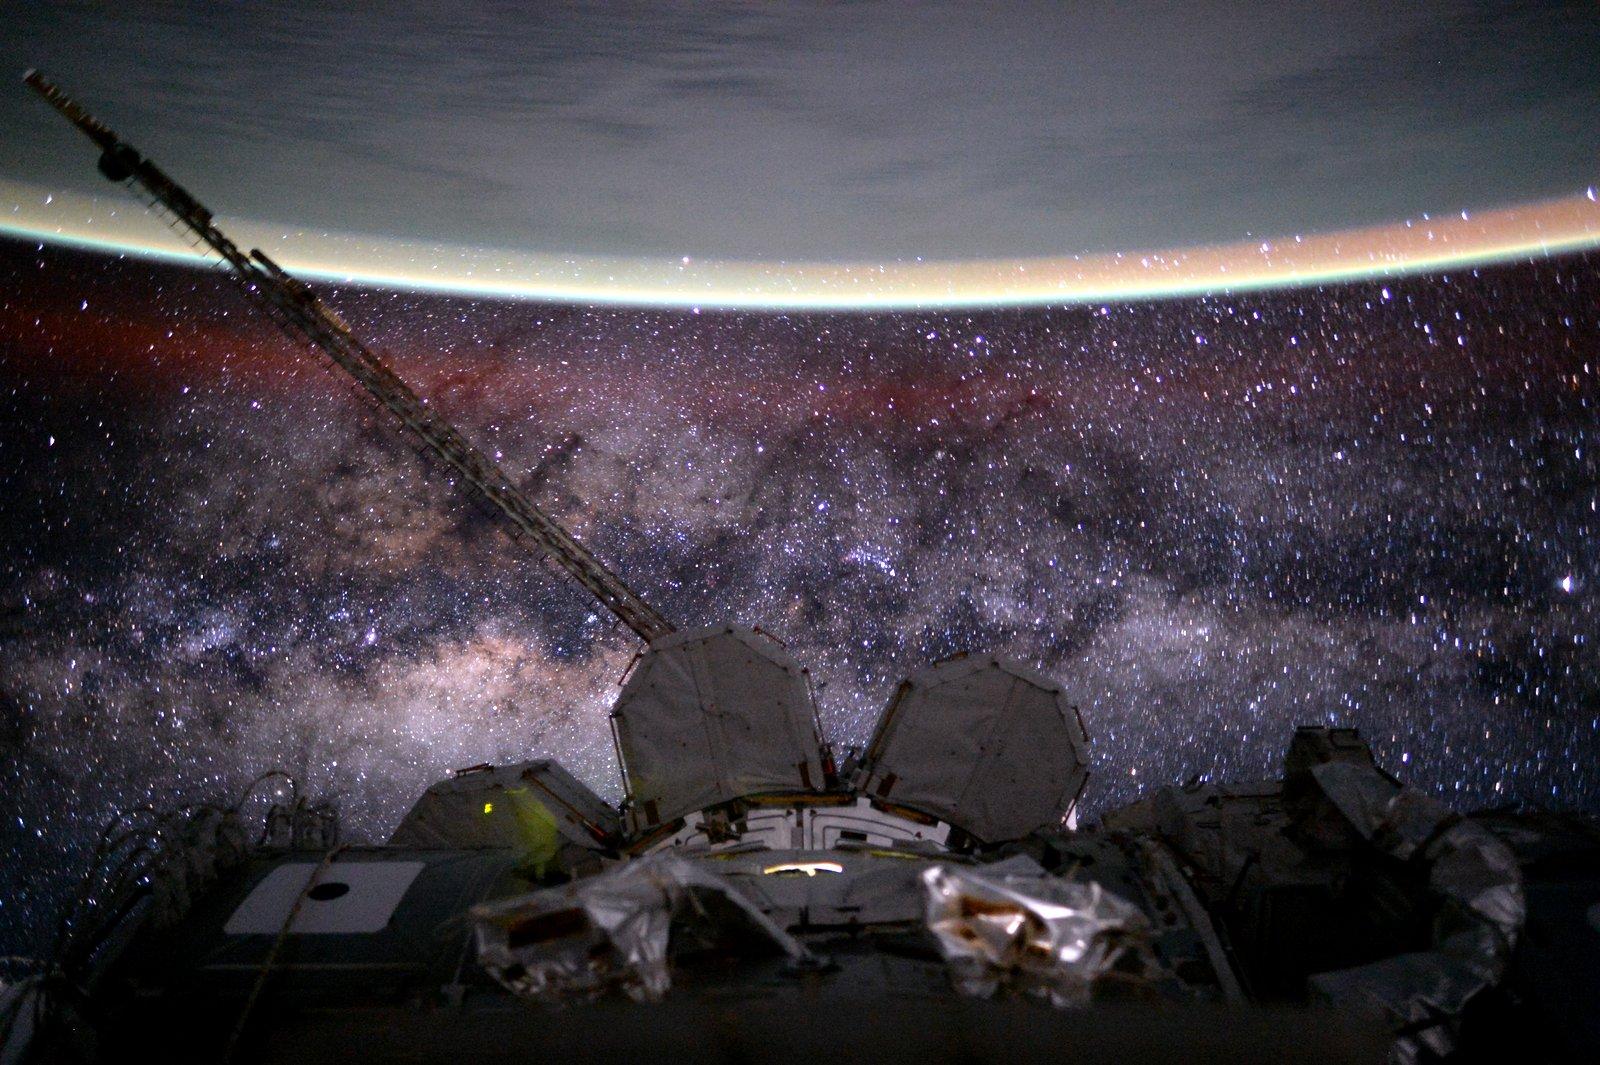 Alienígenas - Astronauta Scott Kelly agosto 2015